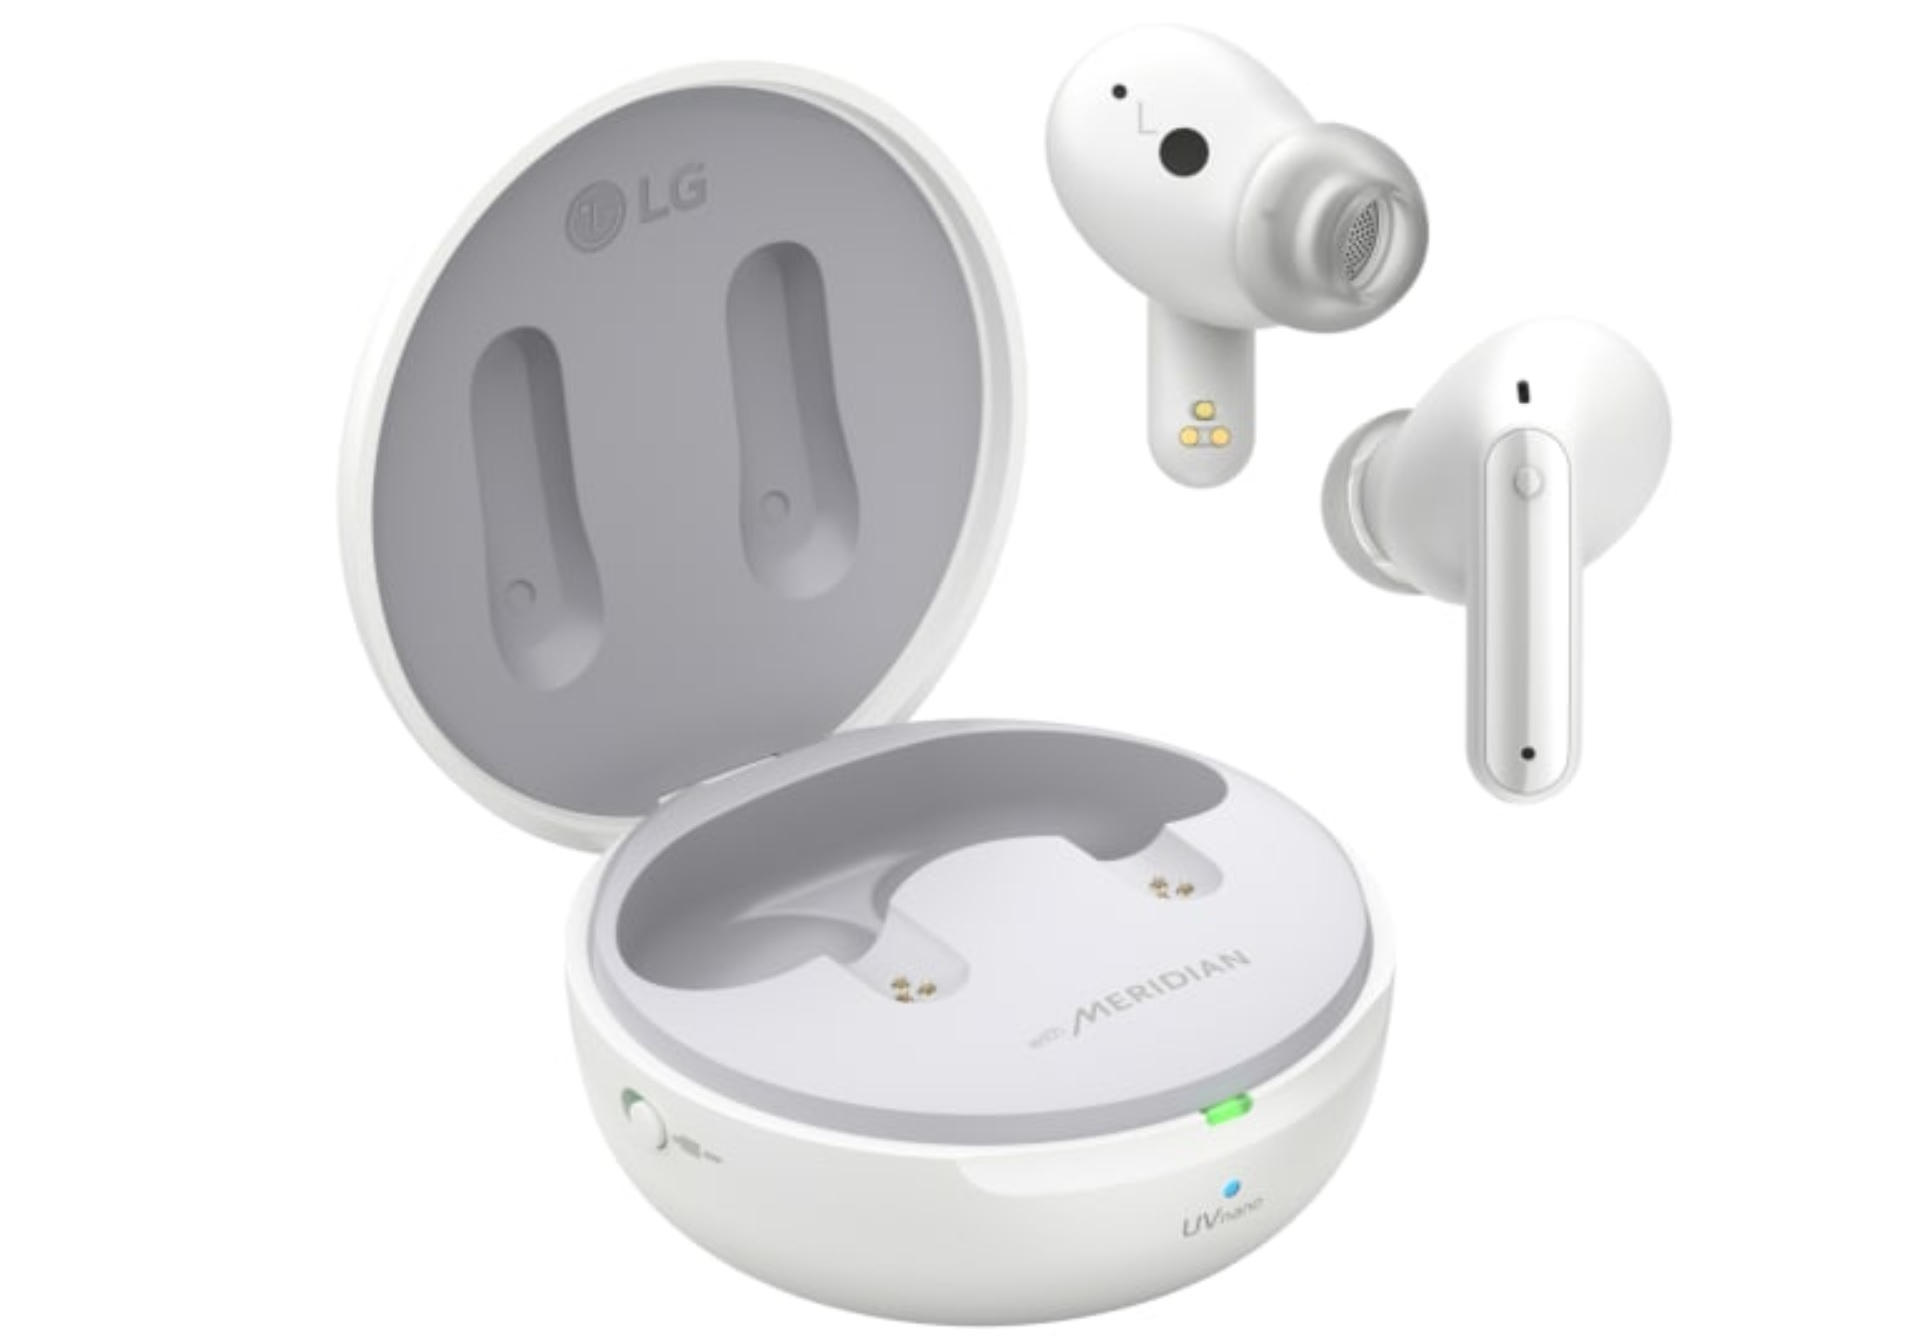 LG TONE Free FP wireless earbuds